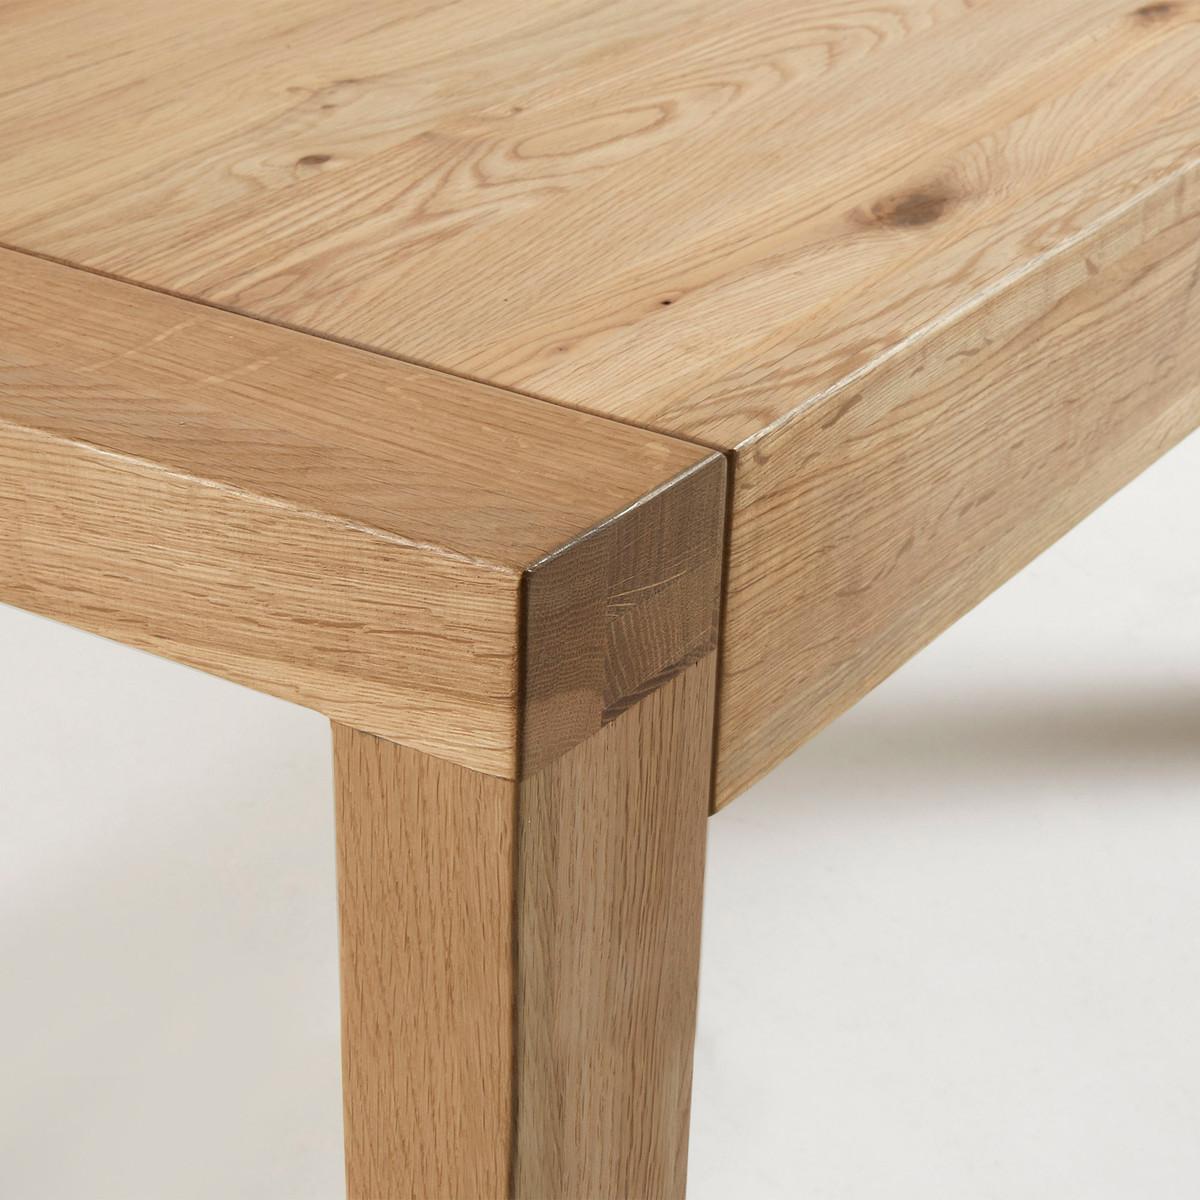 Extensible Naturel Naturel Table Chêne Chêne Ase Table Ase Extensible Table Nwmn0v8O